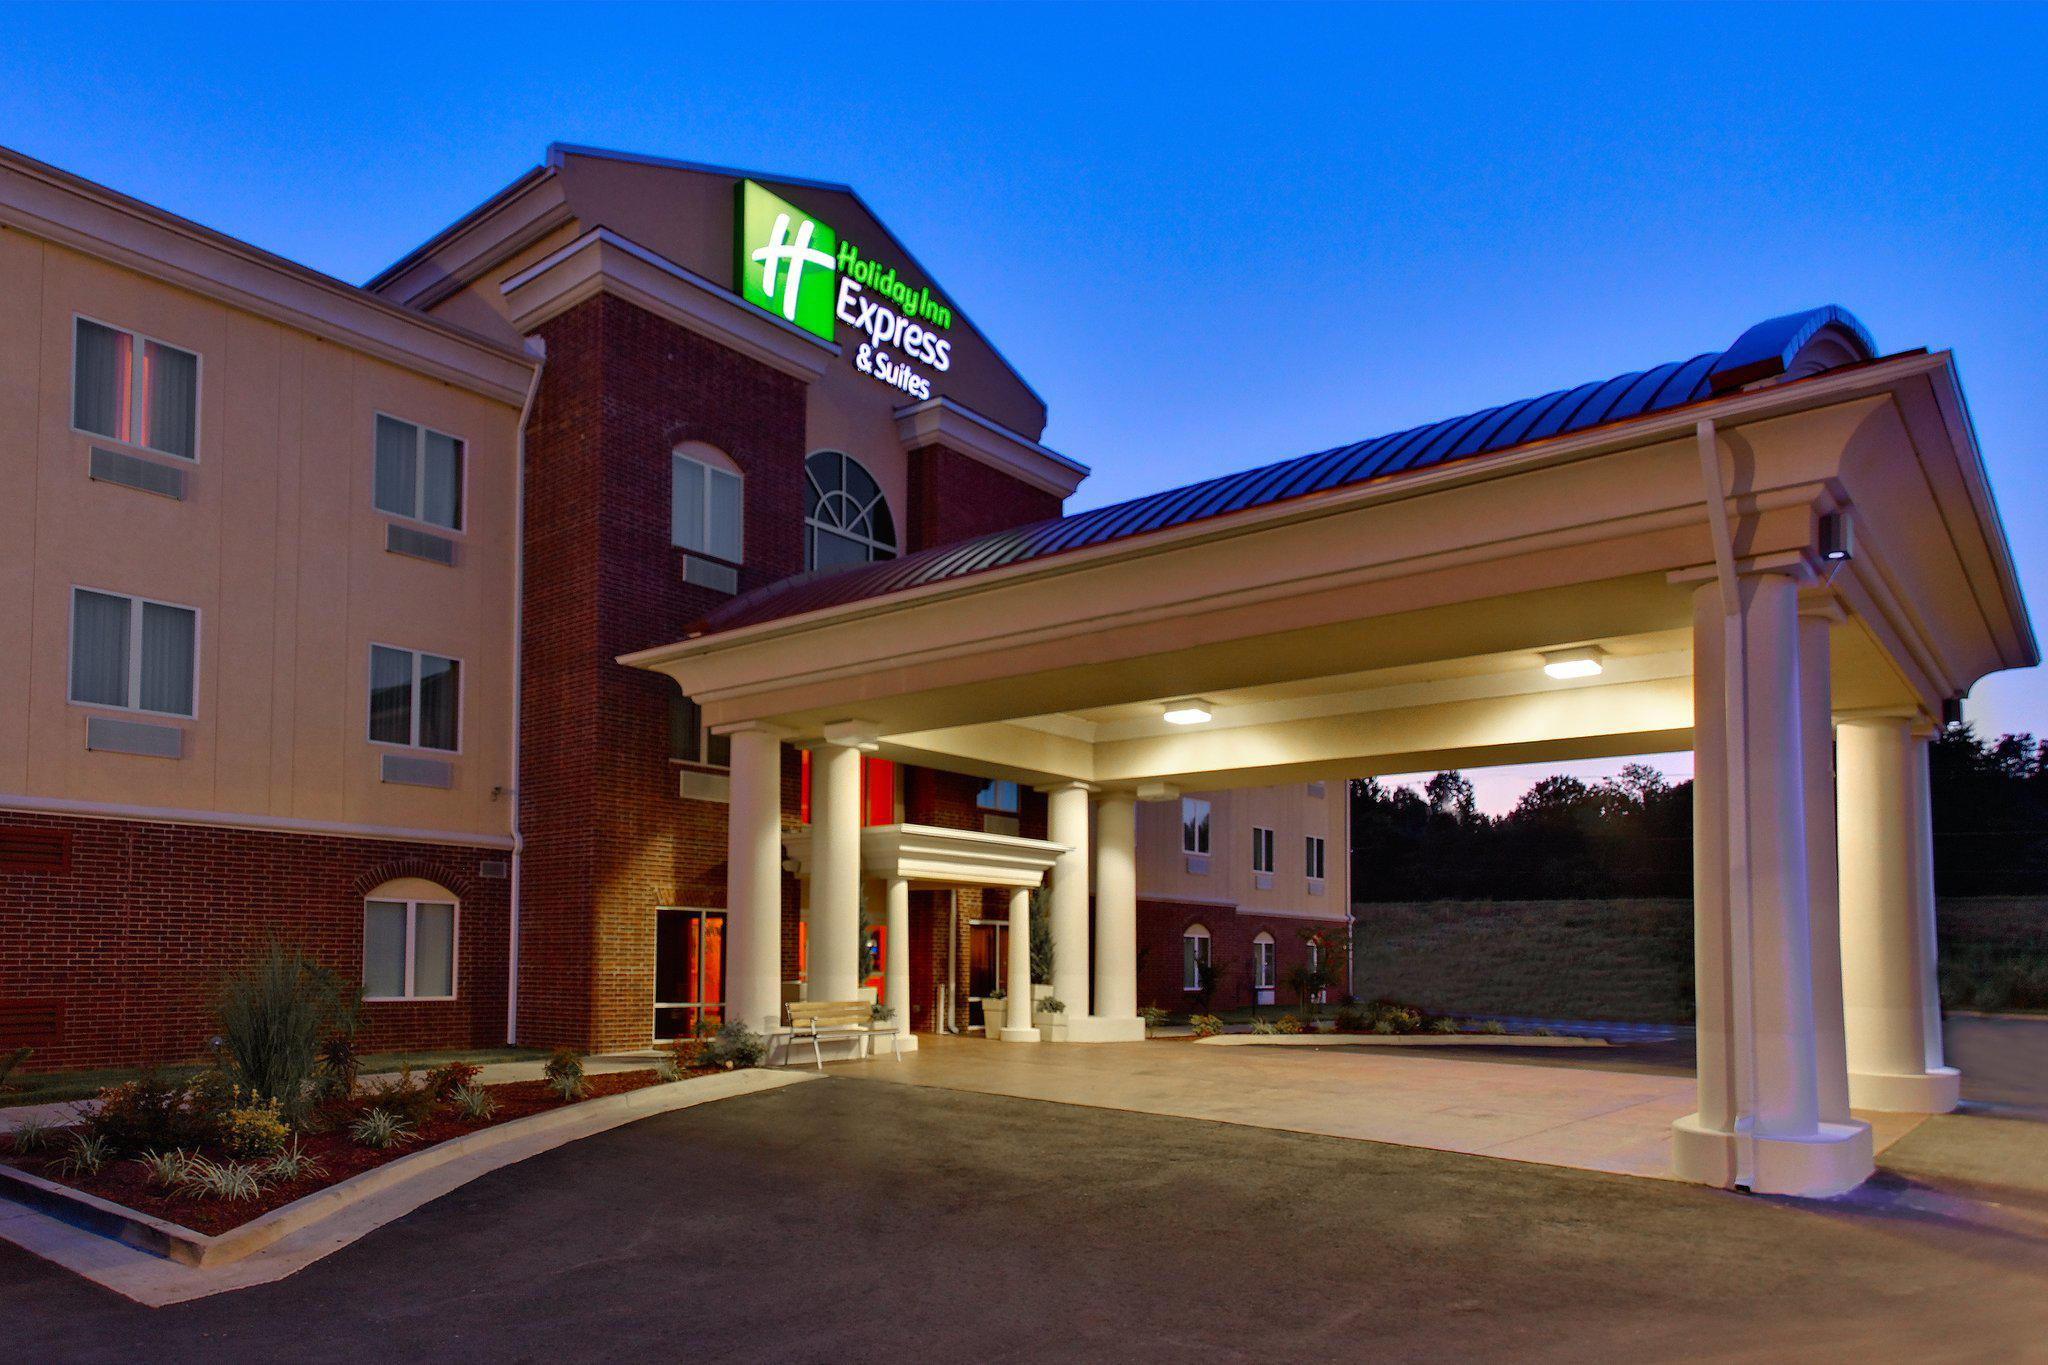 Holiday Inn Express & Suites Malvern, an IHG Hotel